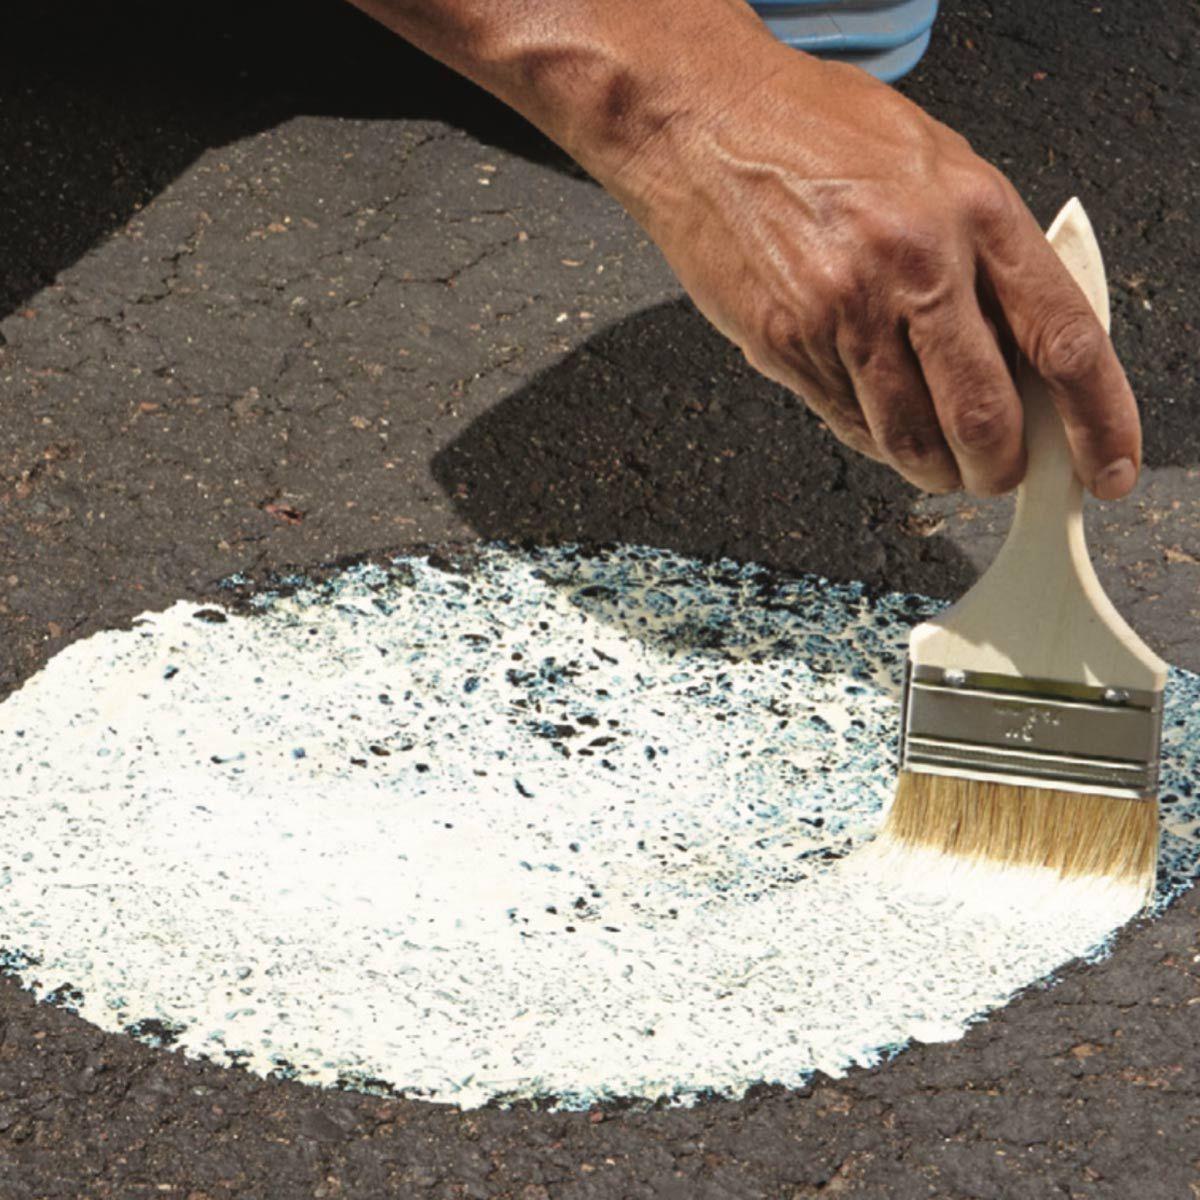 How To Seal An Asphalt Driveway Asphalt Driveway Driveway Asphalt